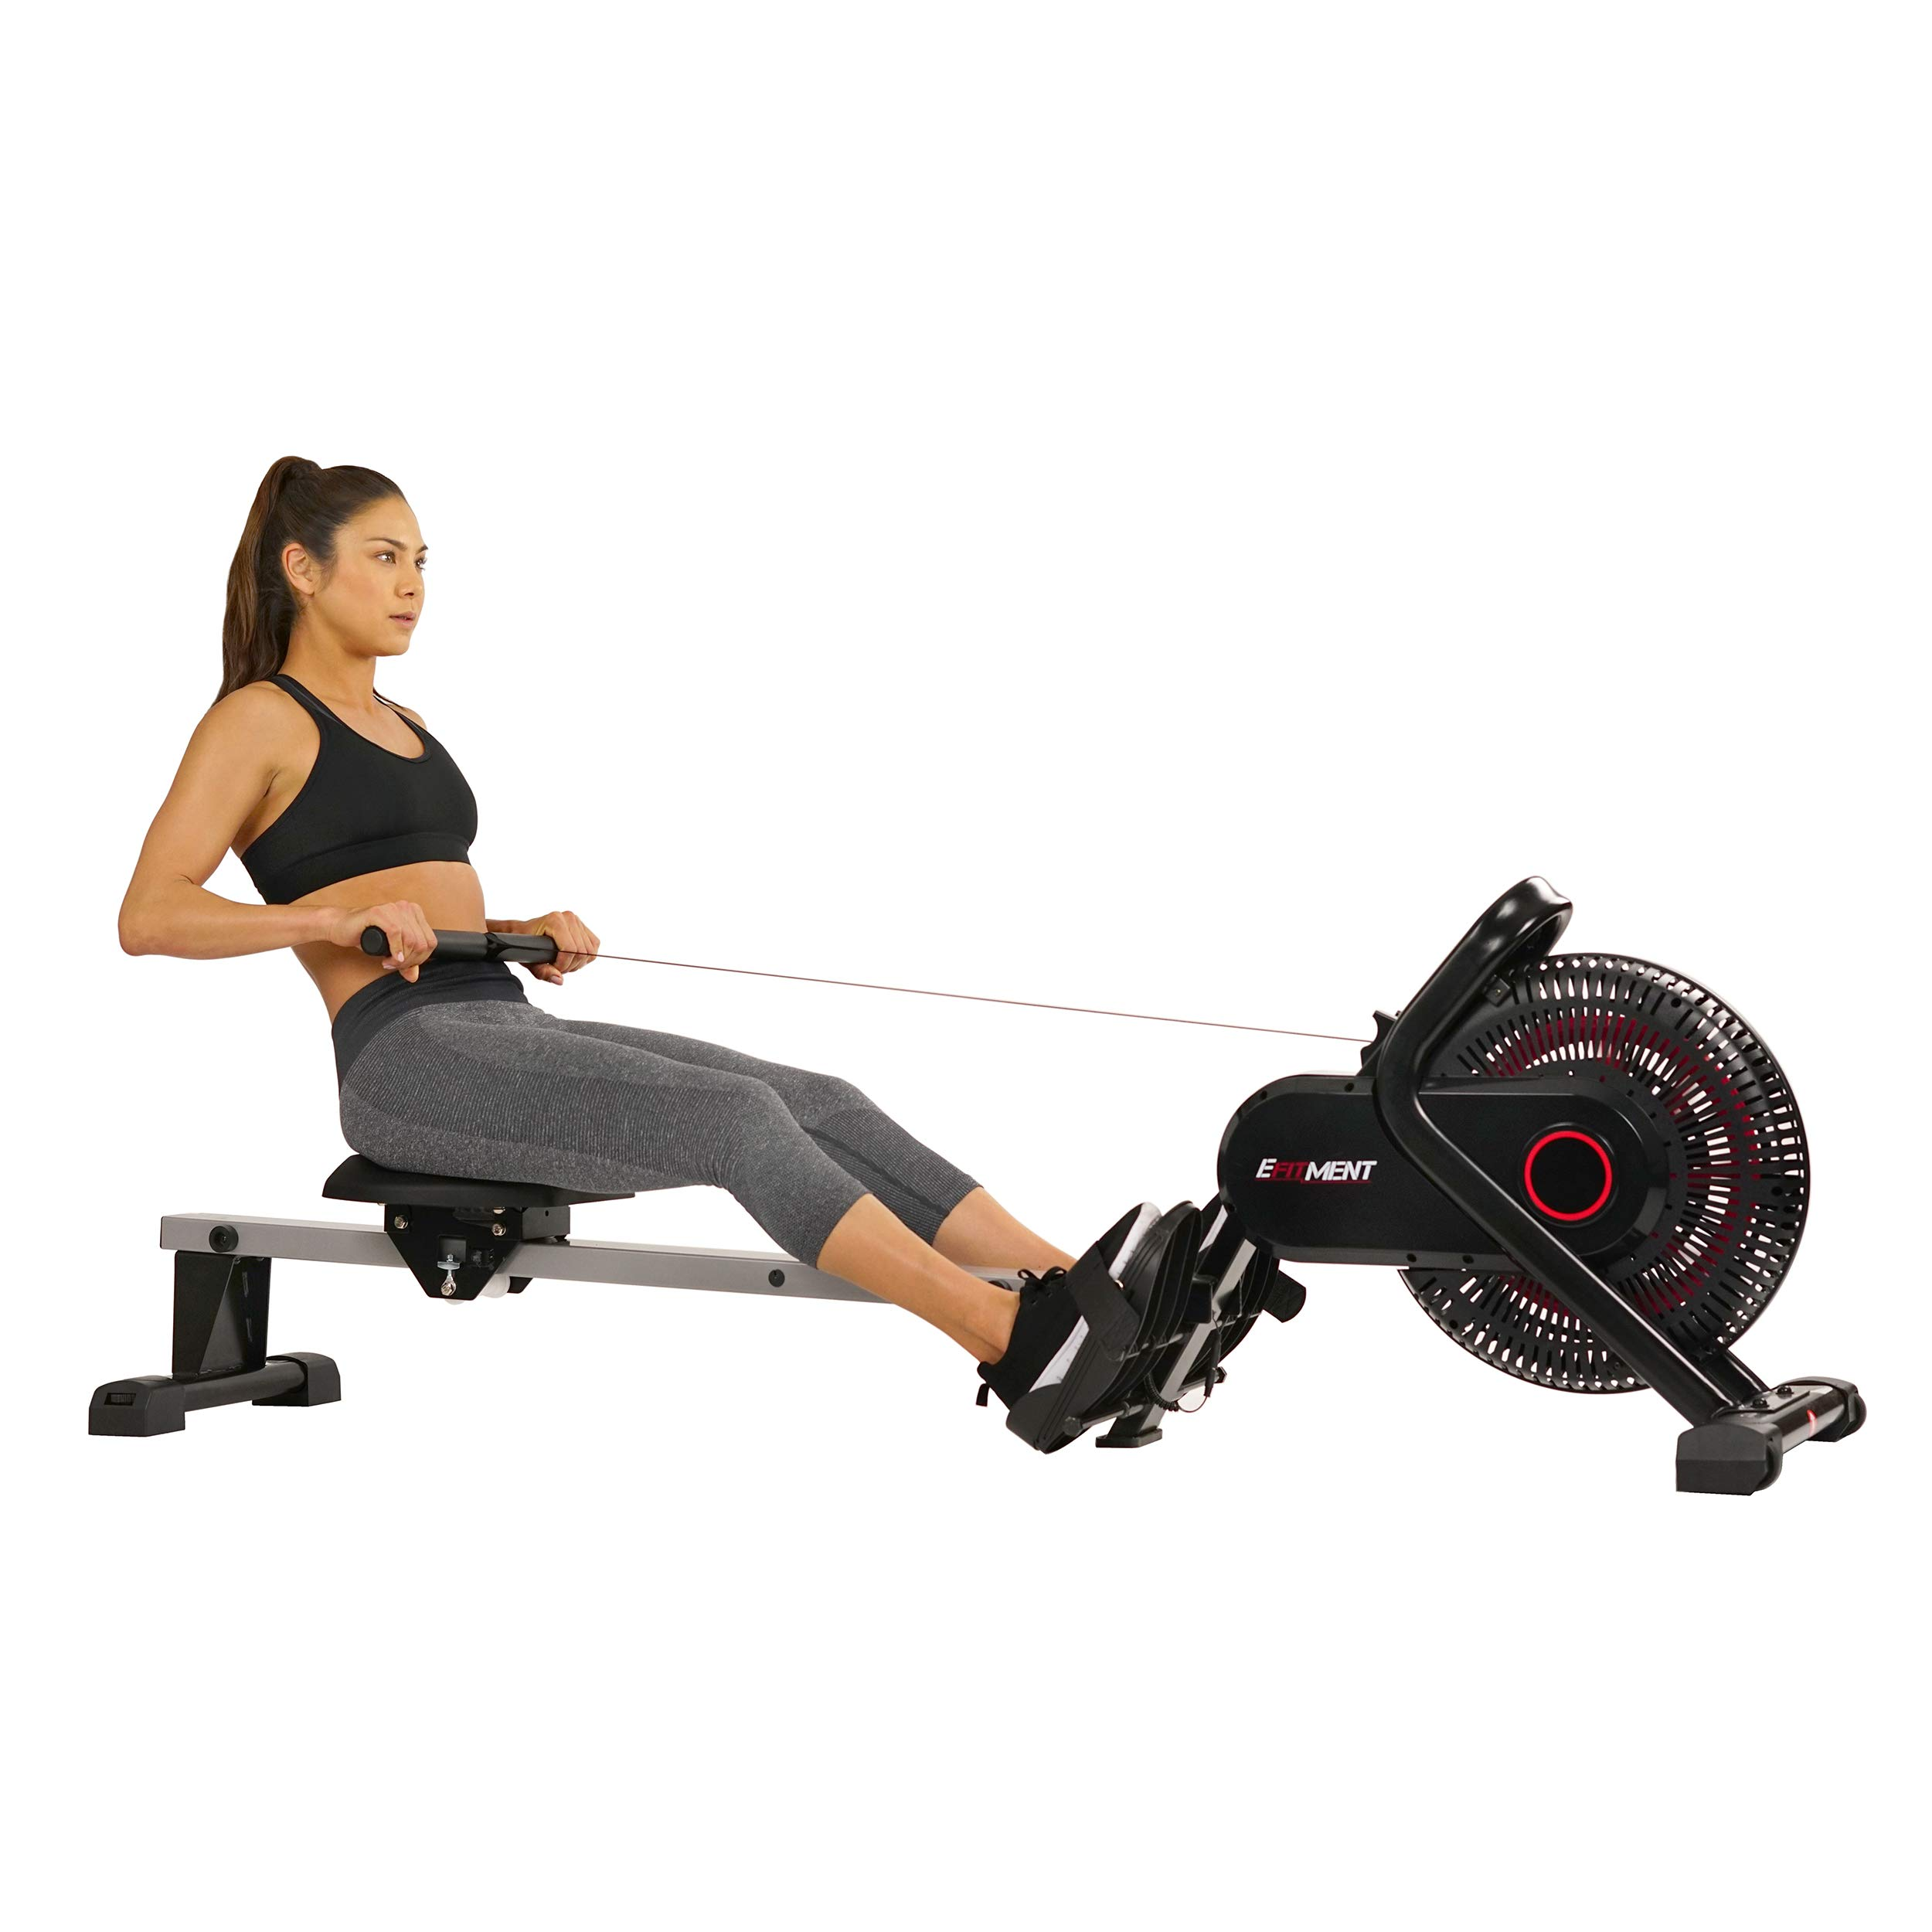 EFITMENT Aero Air Fan Rowing Machine Rower w/LCD Monitor